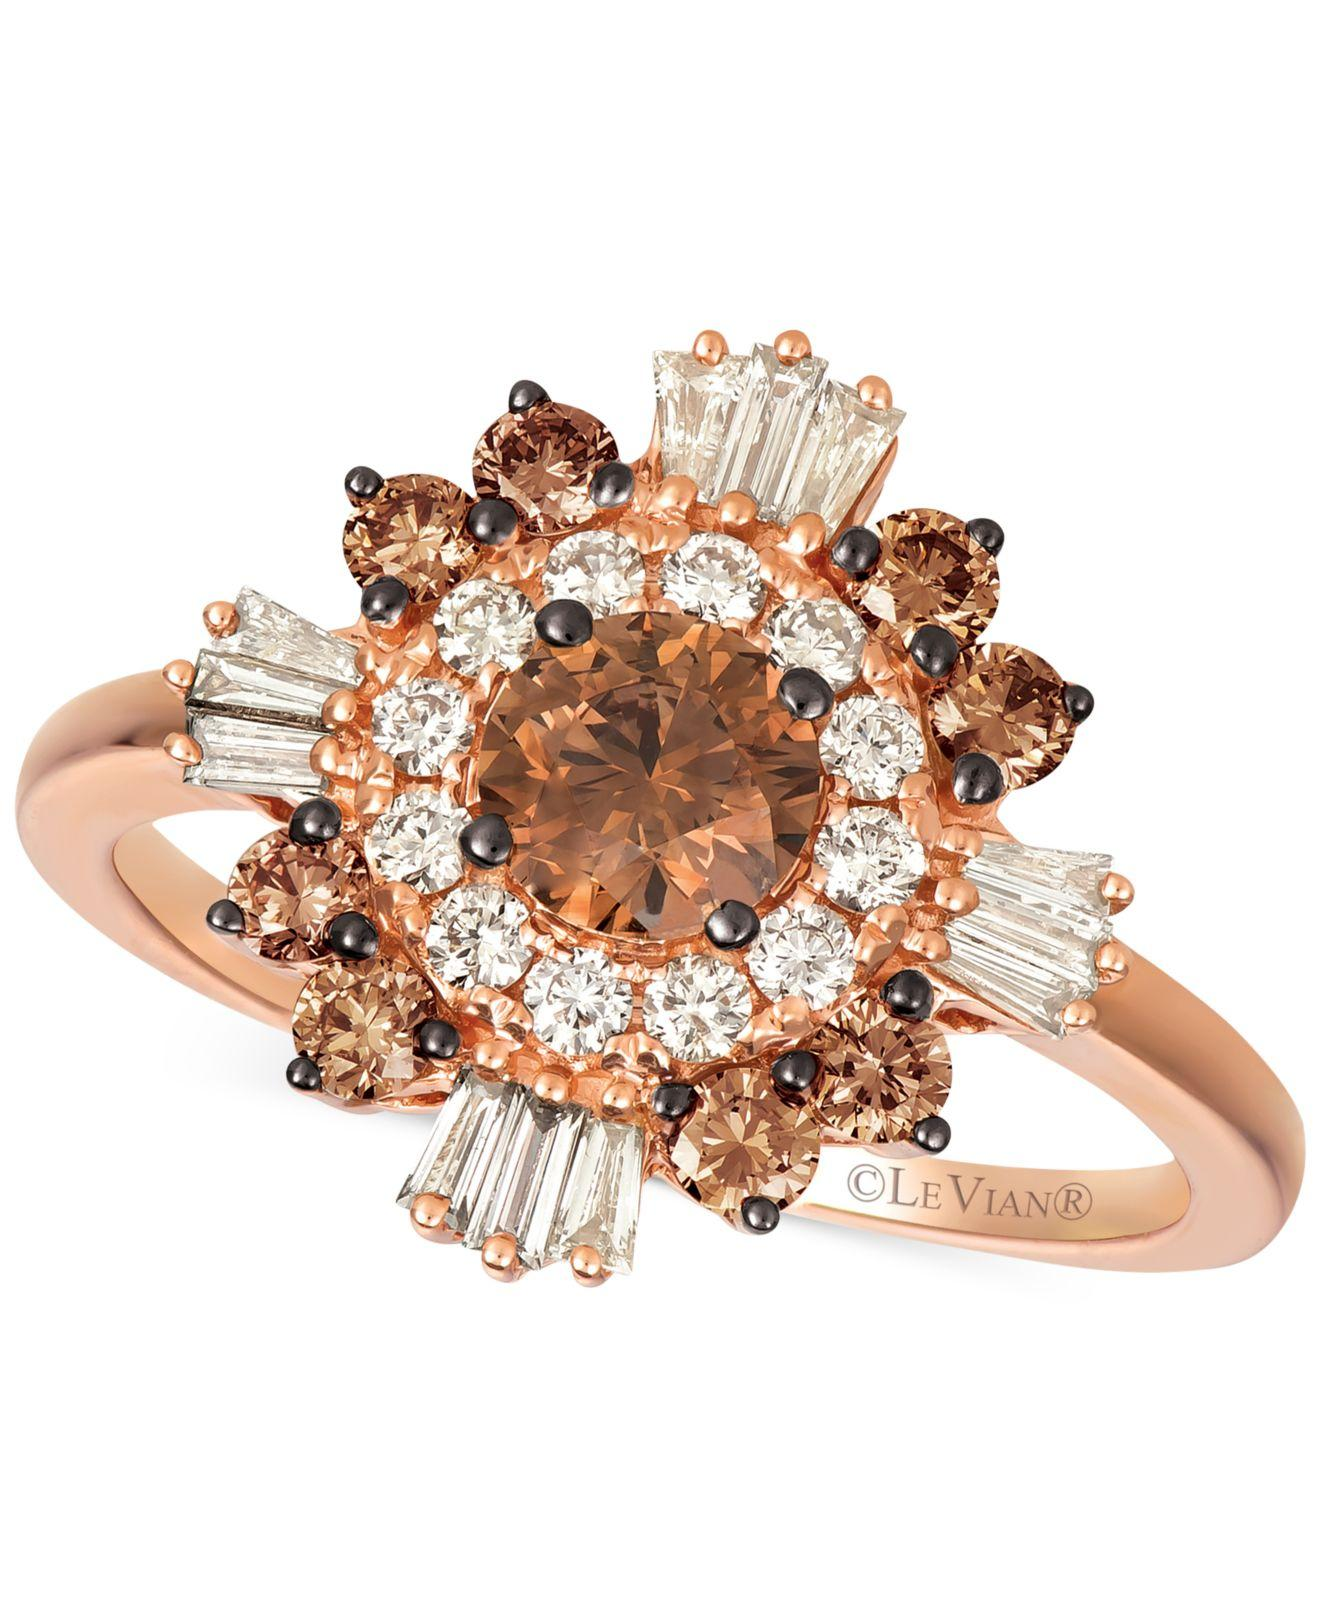 Buy Le Vian Nude Diamond & Chocolate Diamond Statement